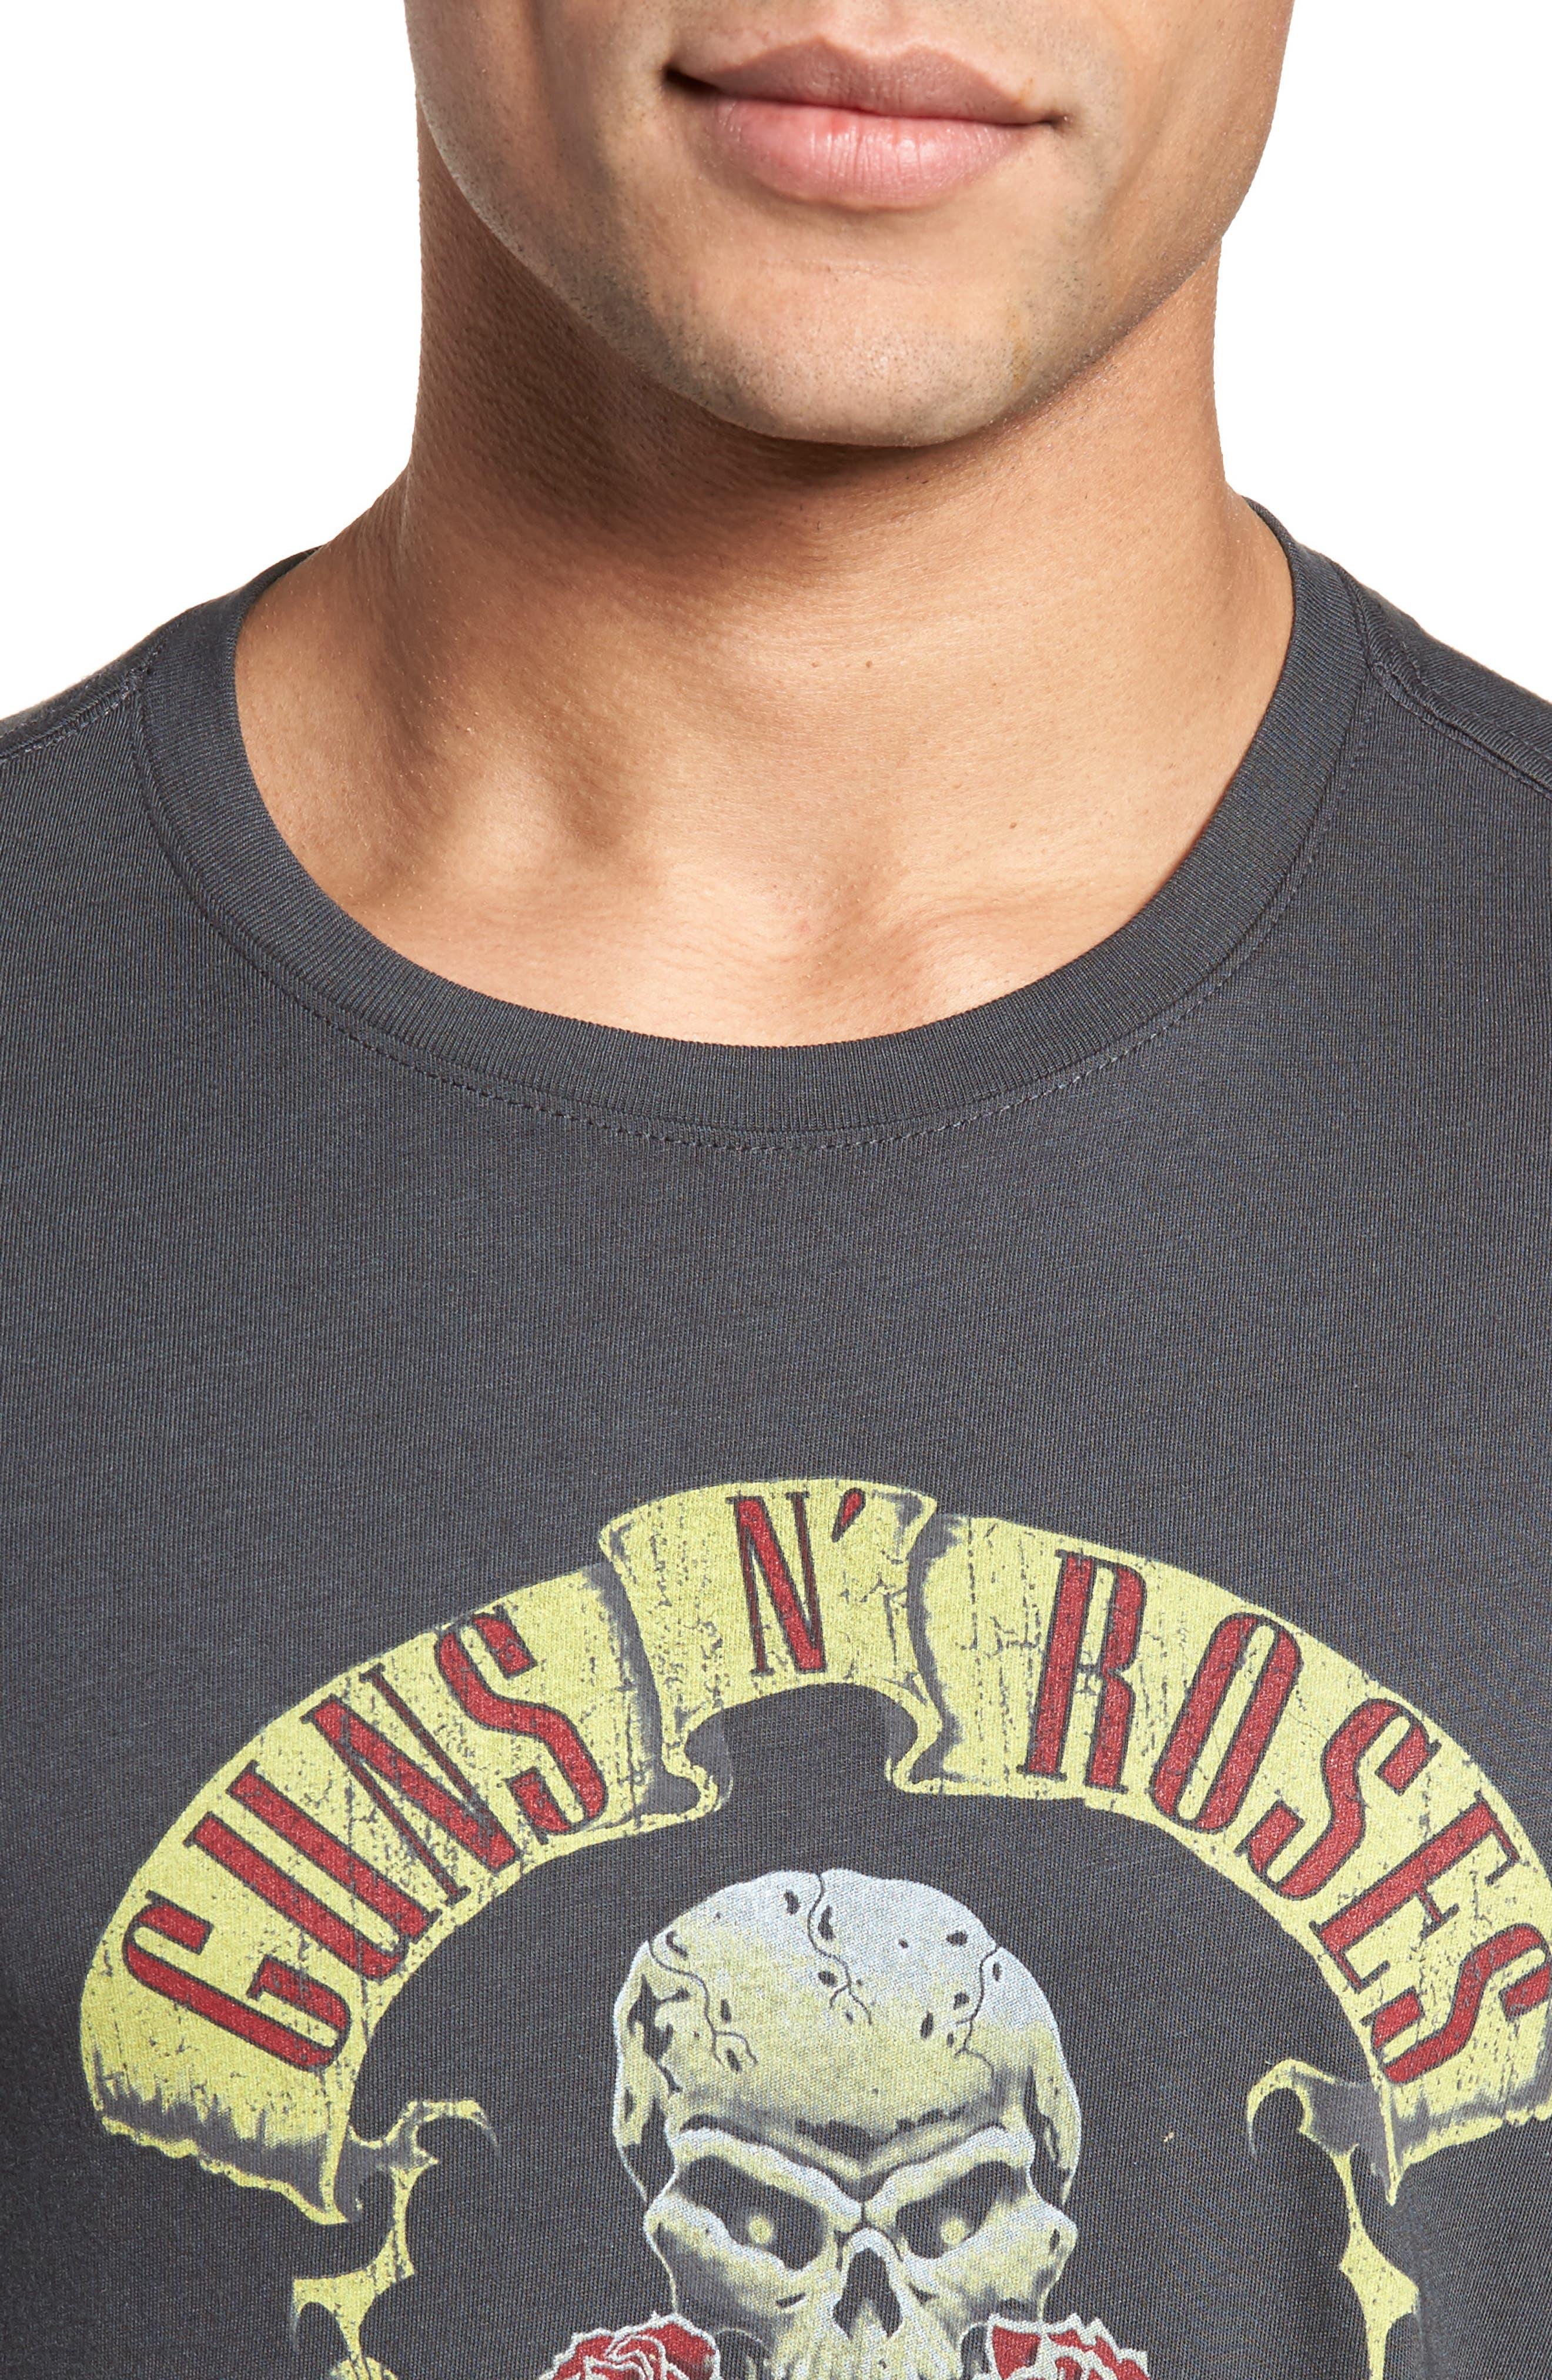 Guns N' Roses Graphic T-Shirt,                             Alternate thumbnail 4, color,